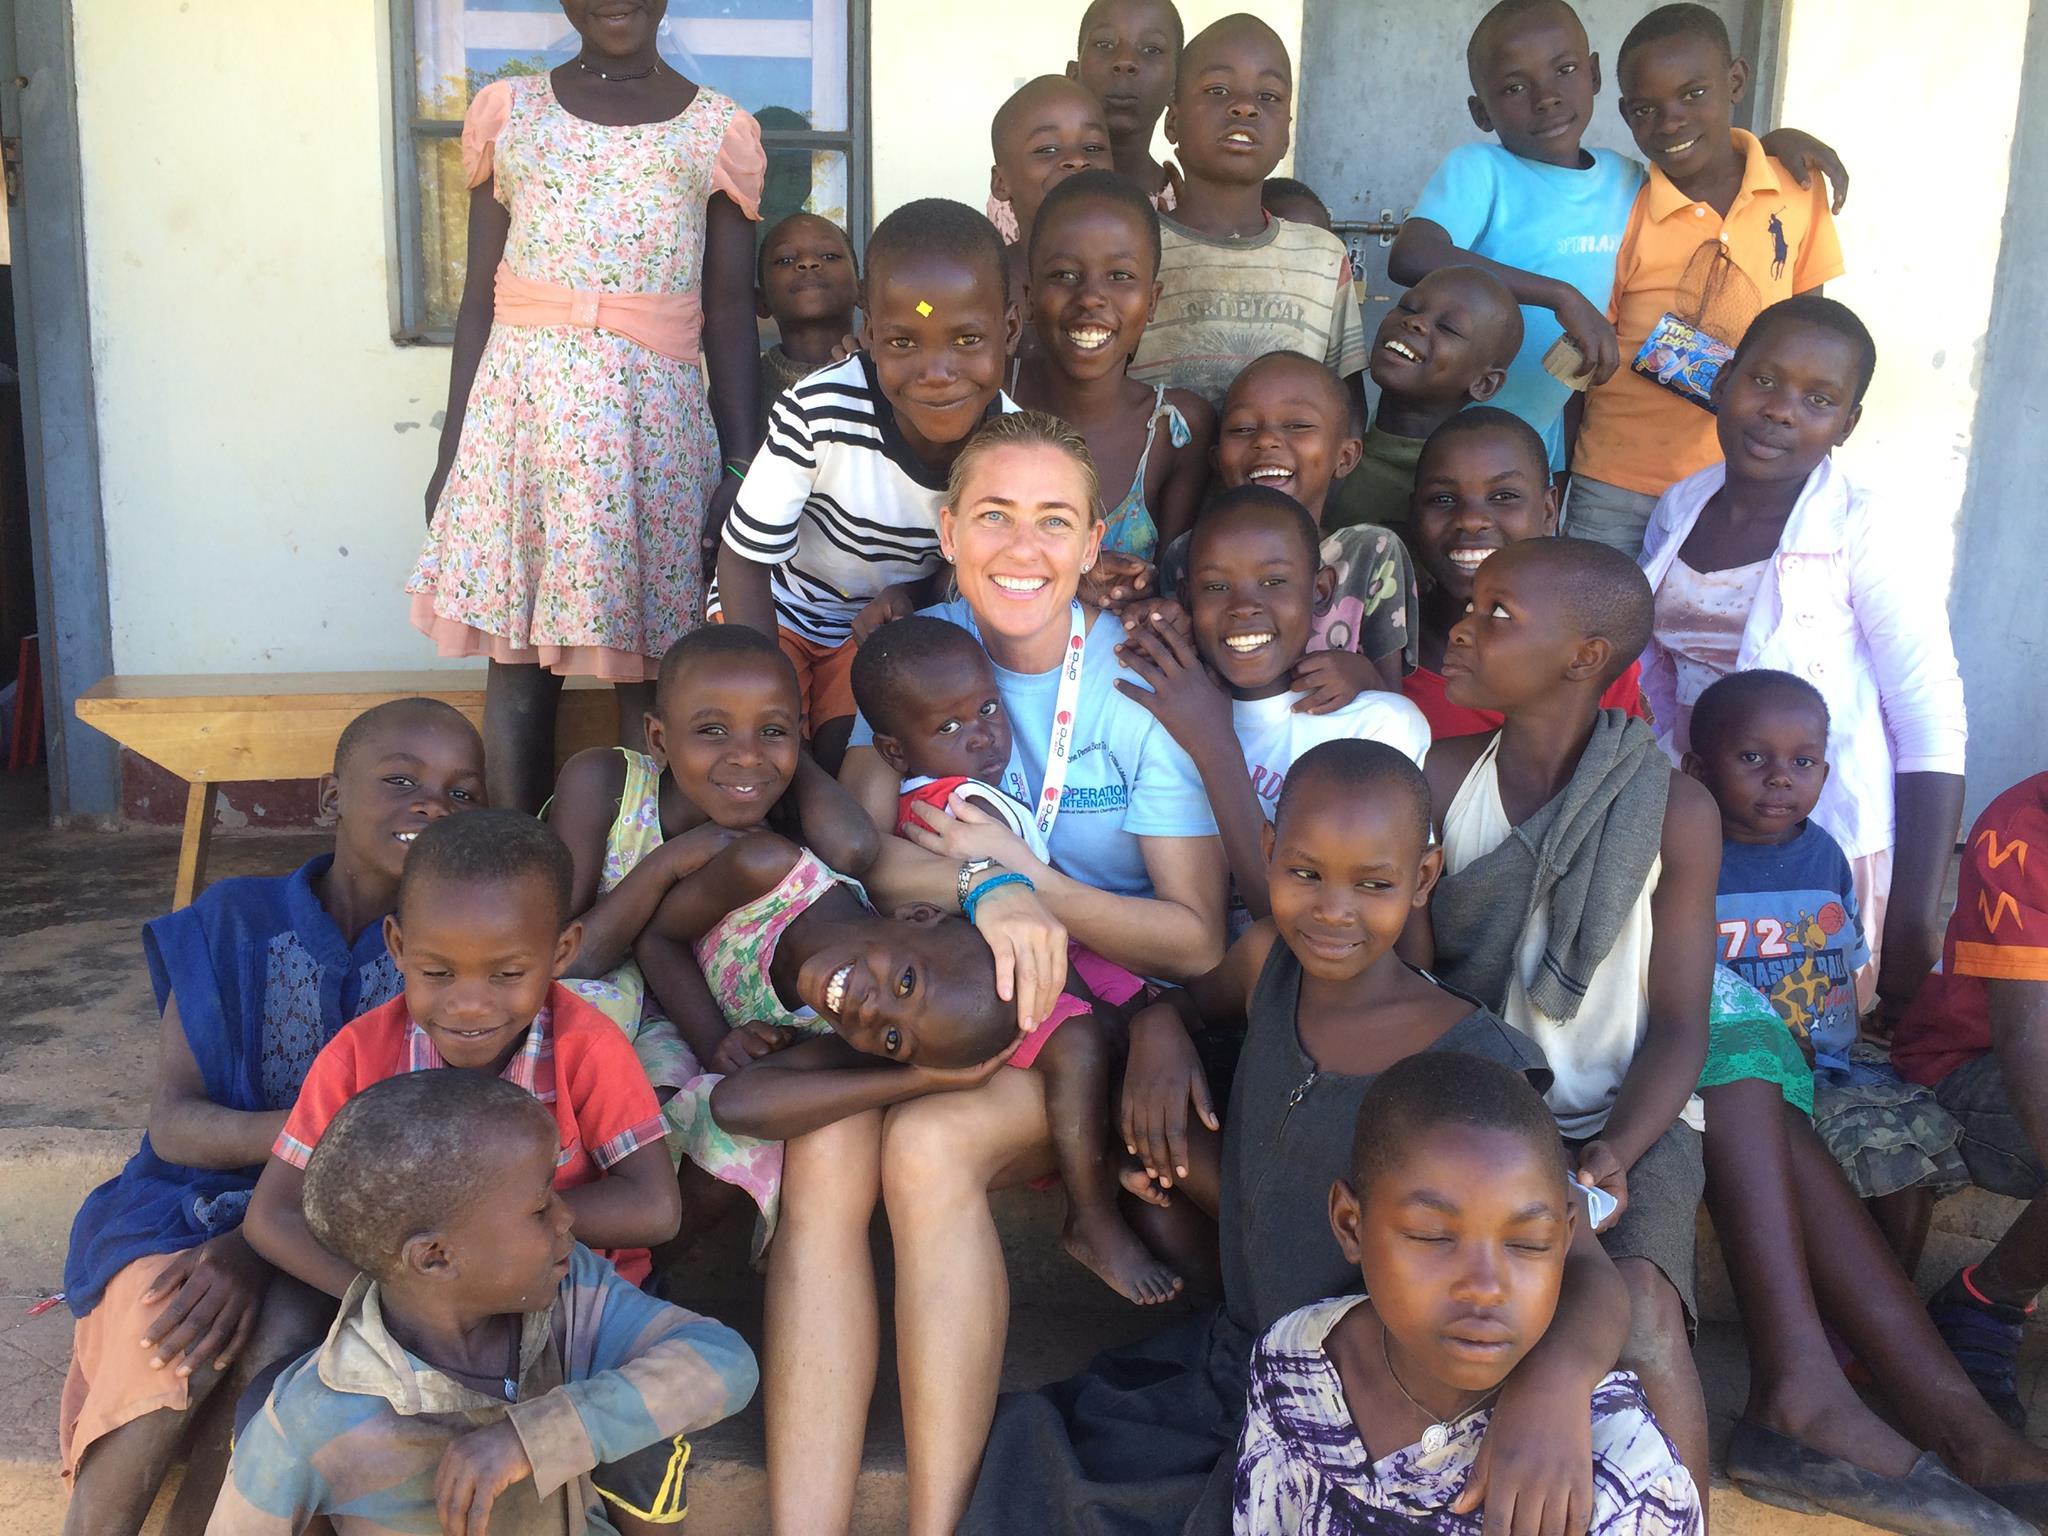 Our children in Uganda! <3